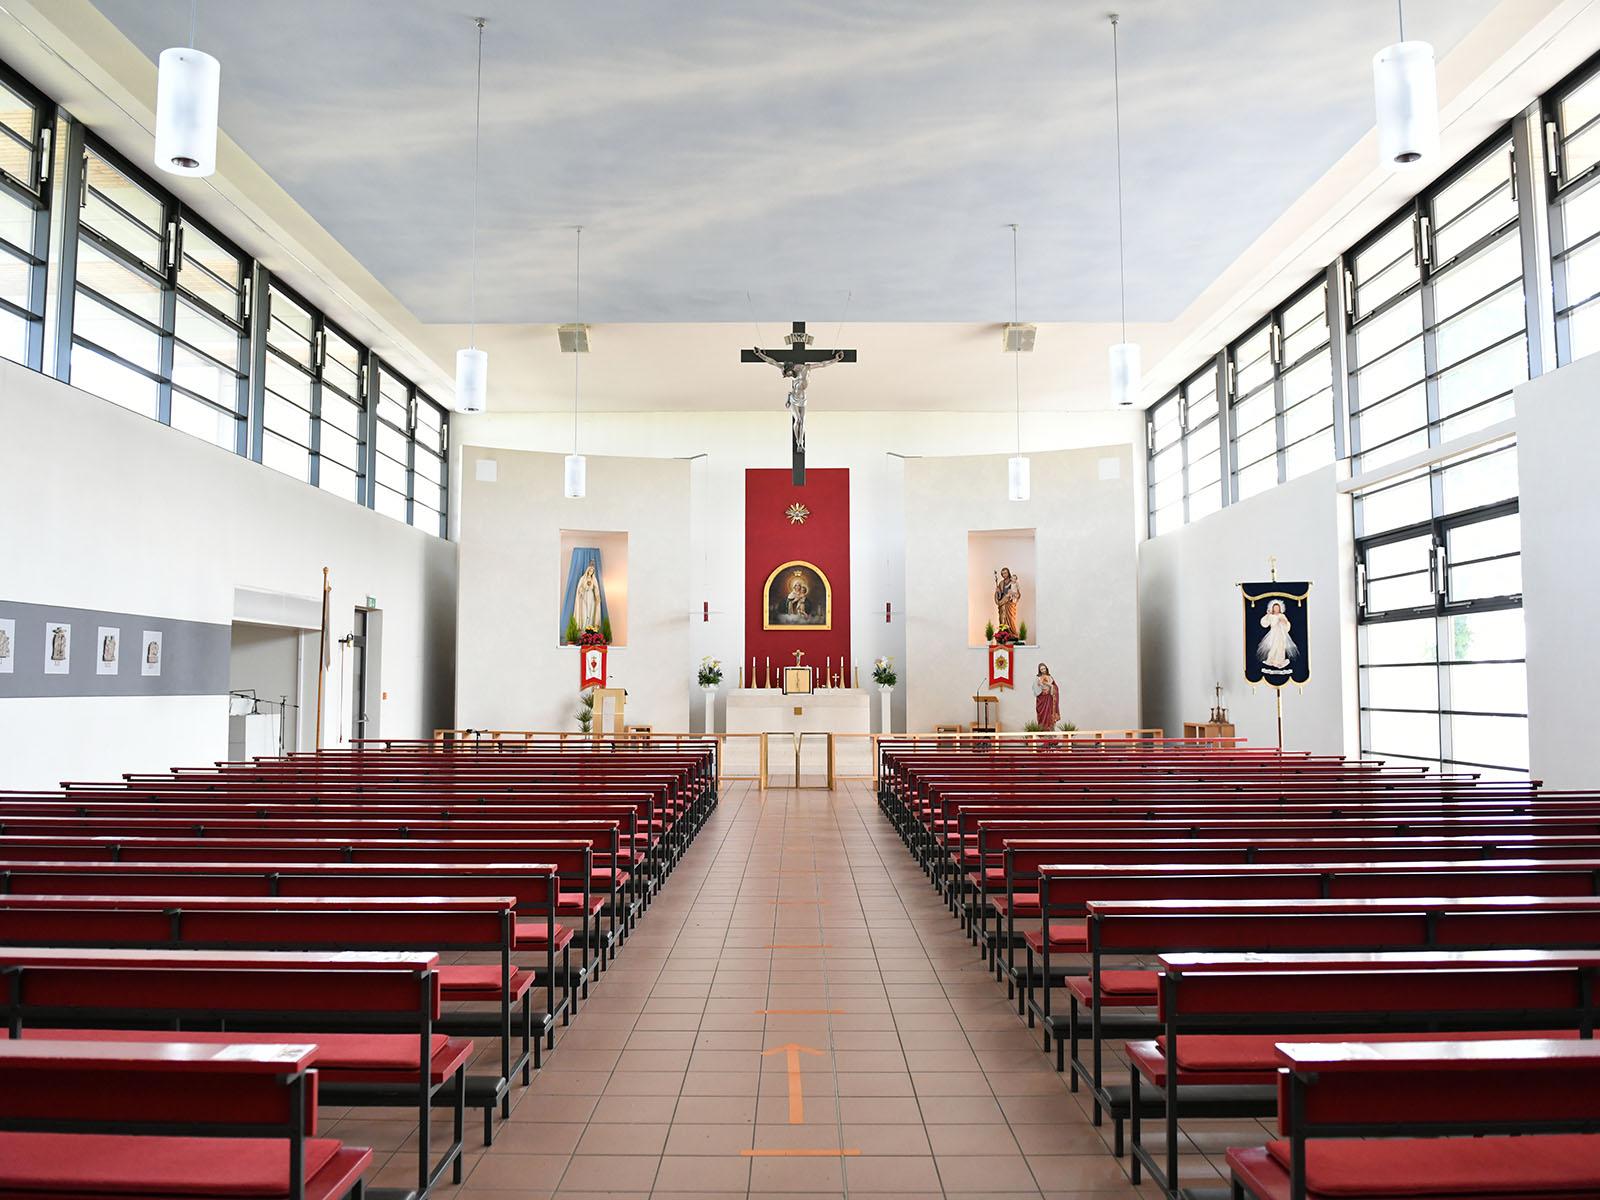 Das Kircheninnere